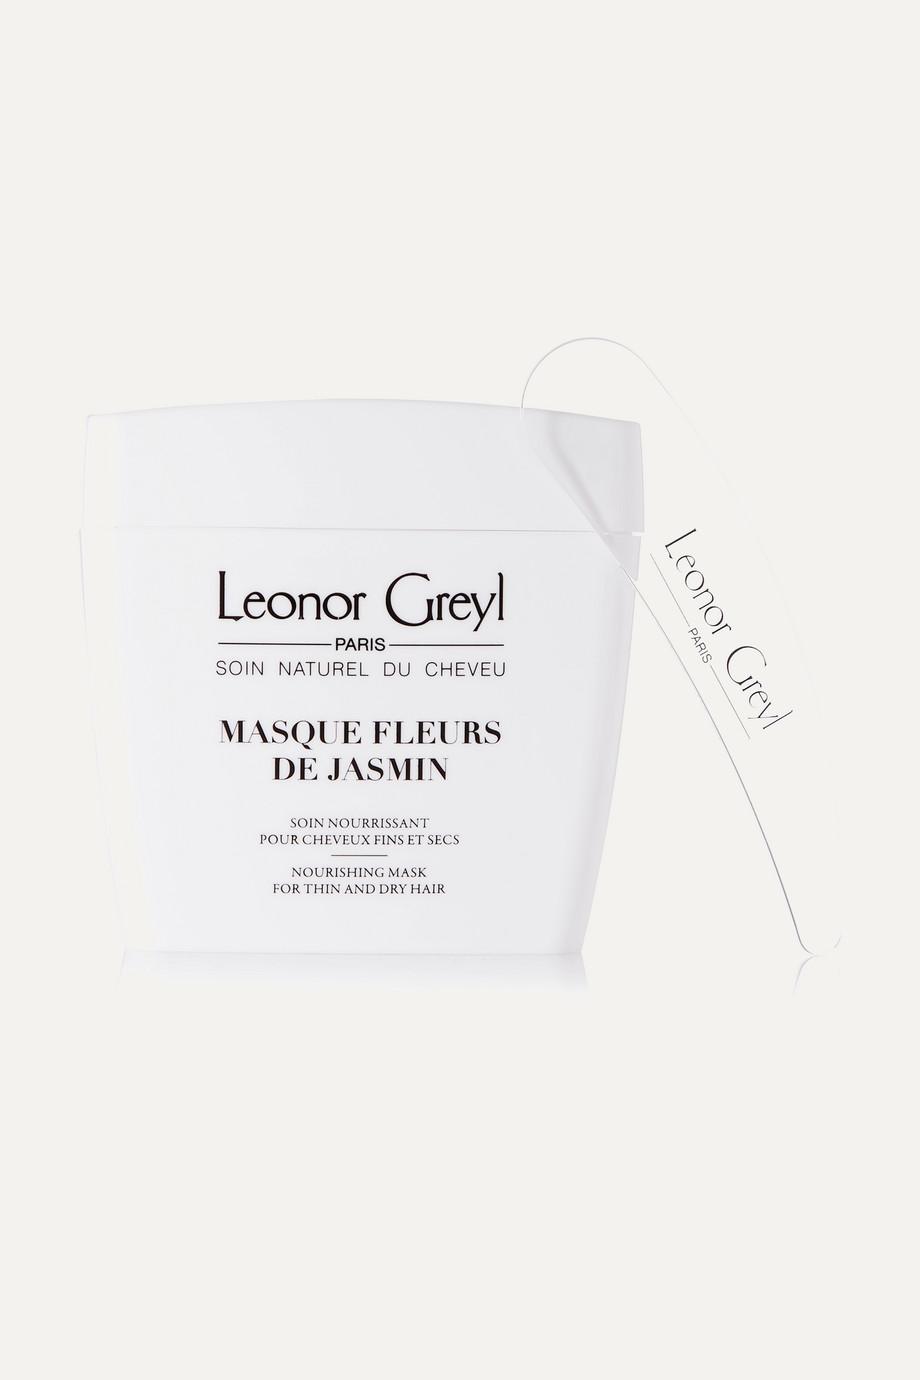 Leonor Greyl Paris Masque Fleurs de Jasmin, 200ml